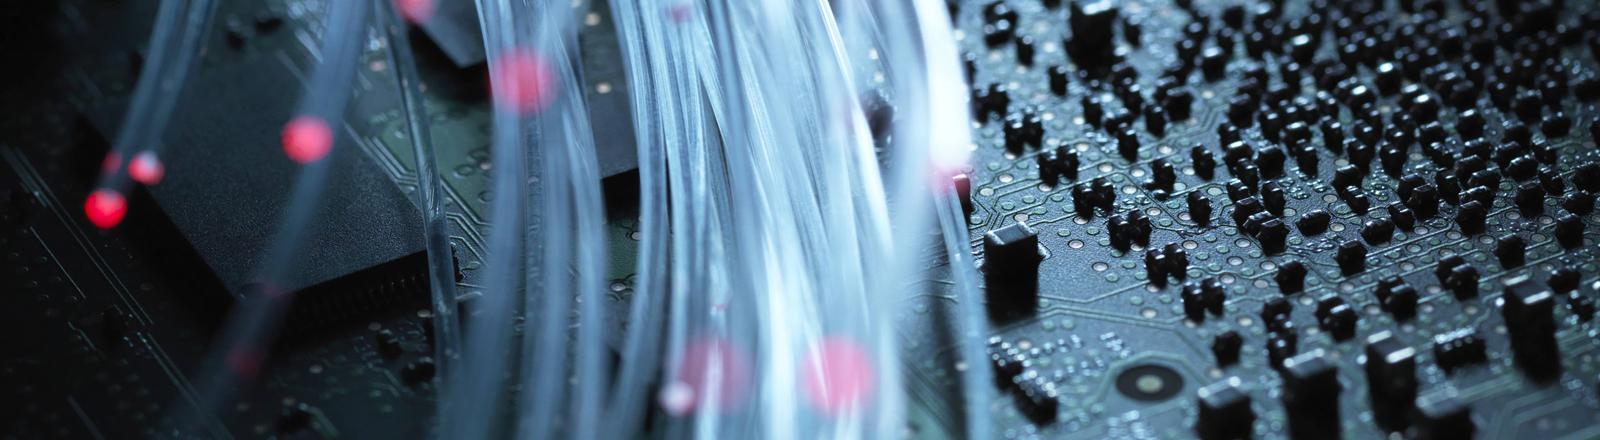 Breitbandkabel in Nahaufnahme